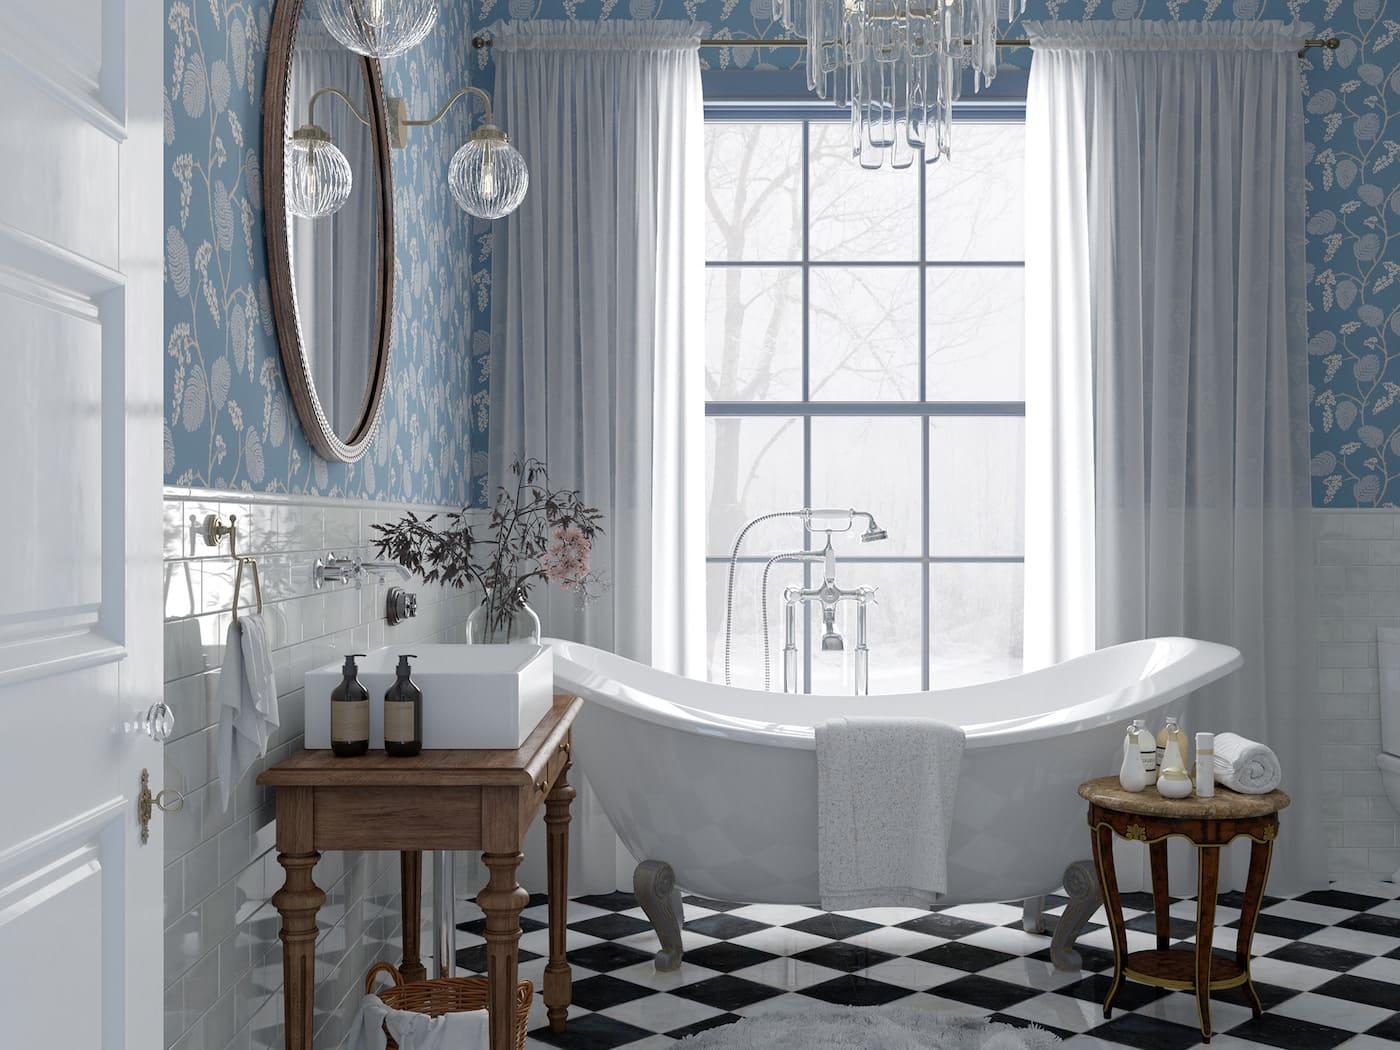 модный дизайн интерьера квартиры фото 47